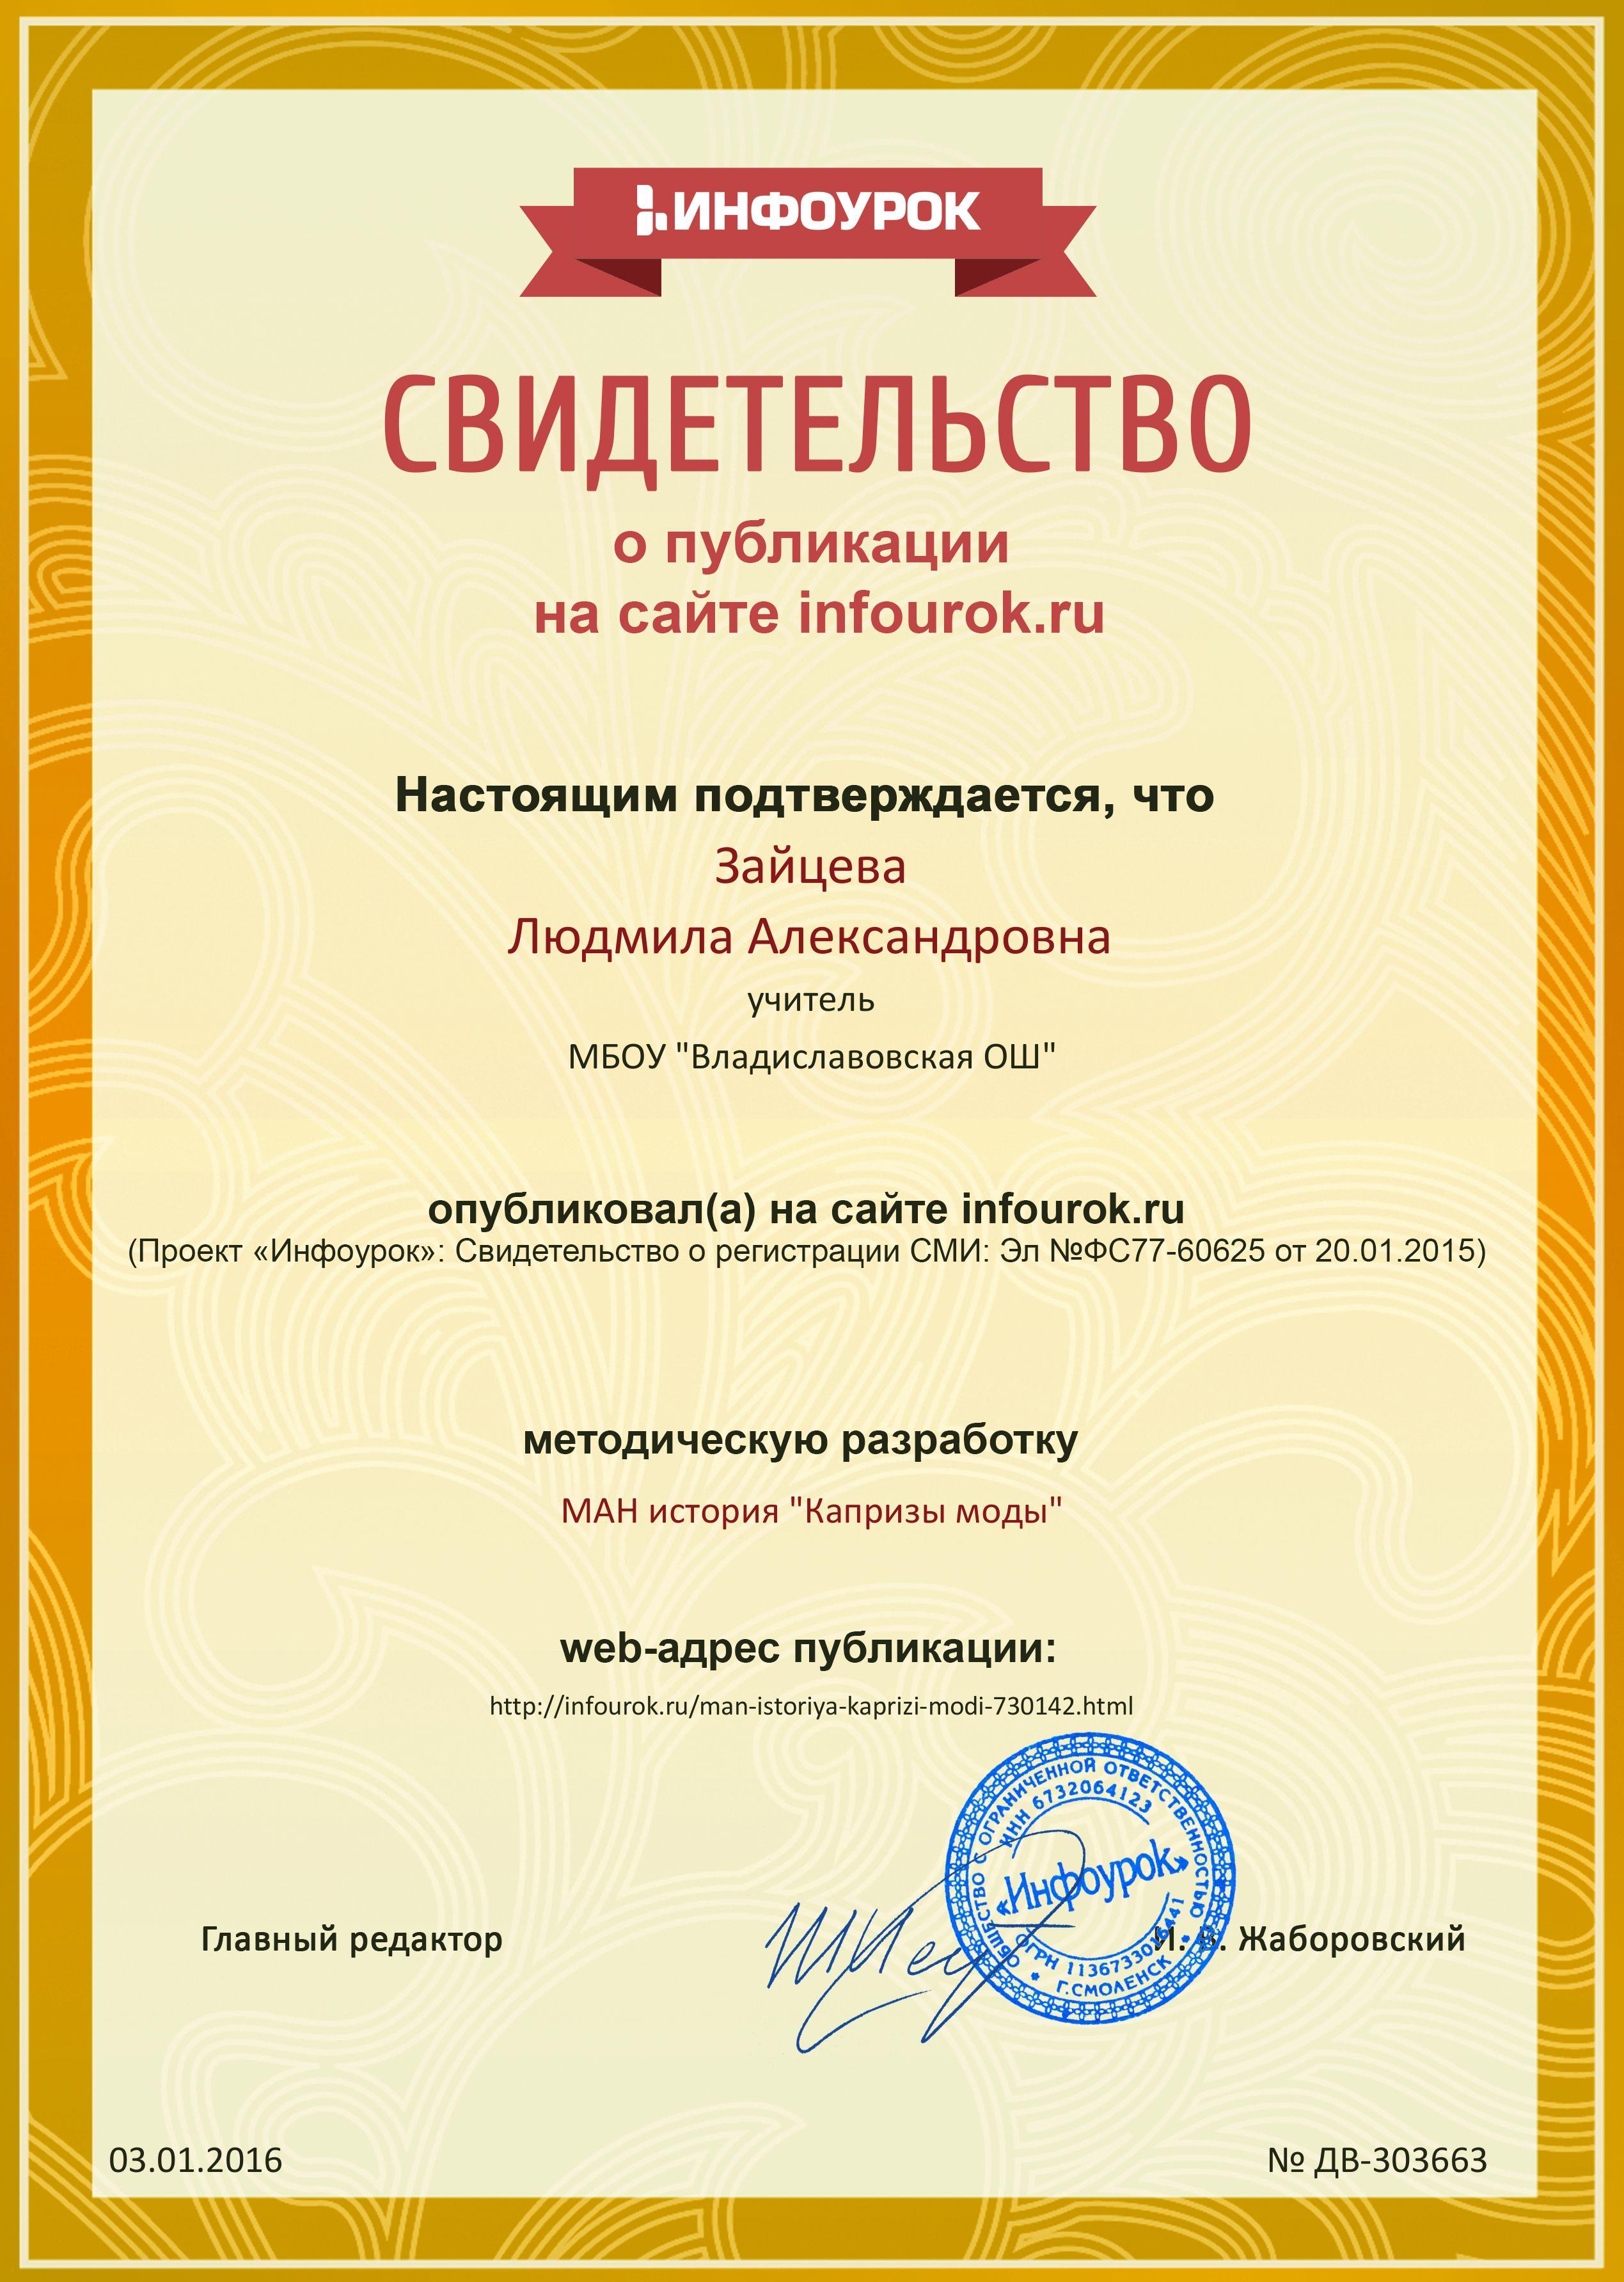 D:\школа\аттестация\Сертификат проекта infourok.ru № ДВ-303663.jpg